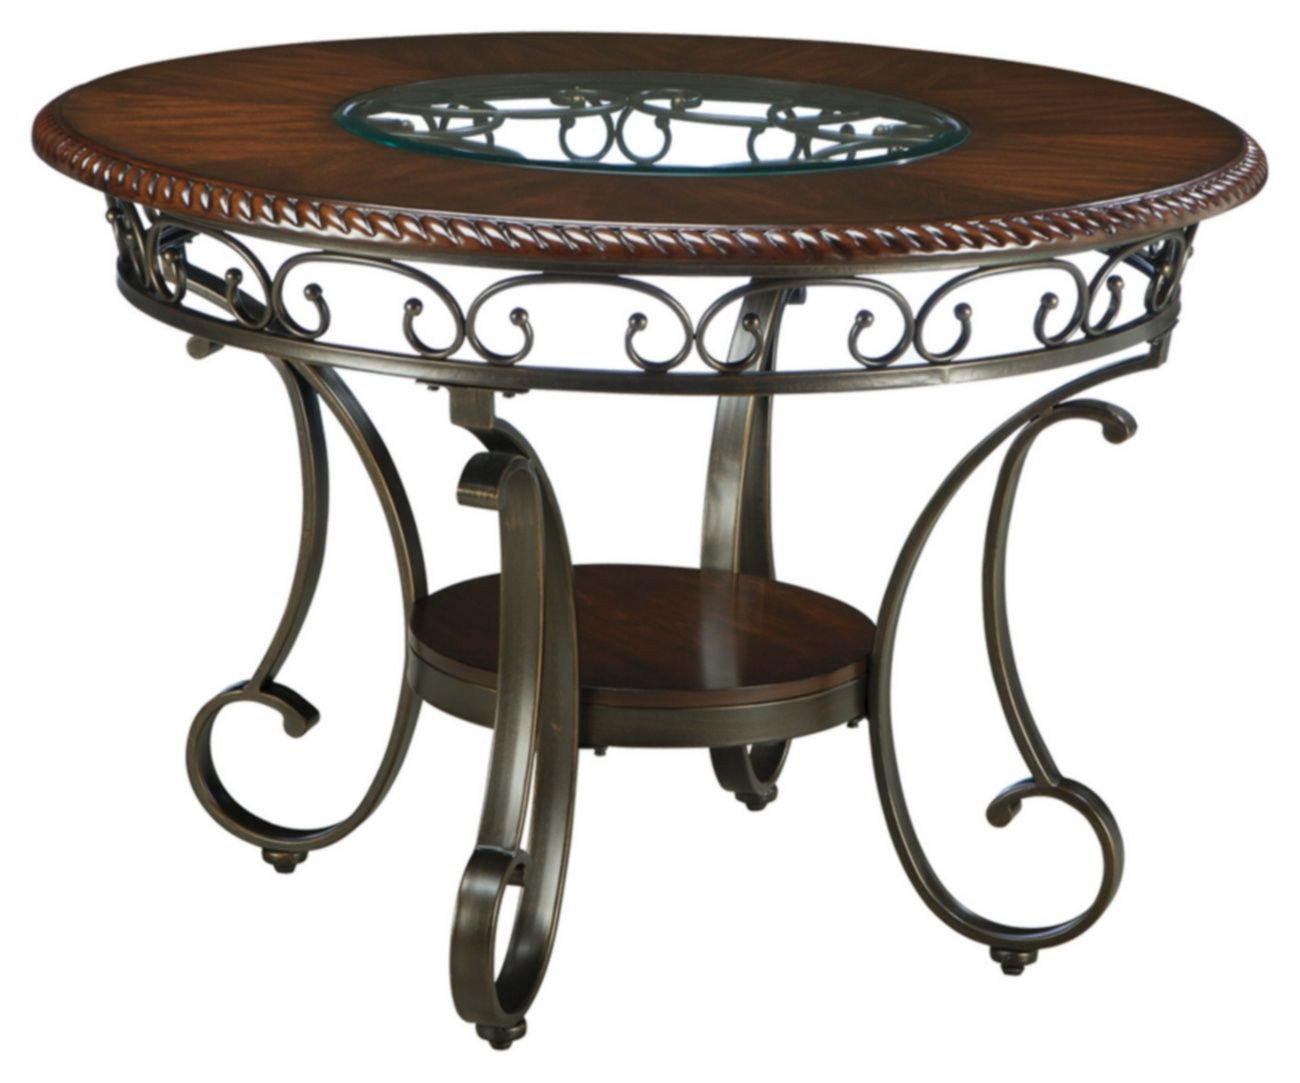 Signature Design Glambrey Round Dining Room Table Ashley Furniture D329 15